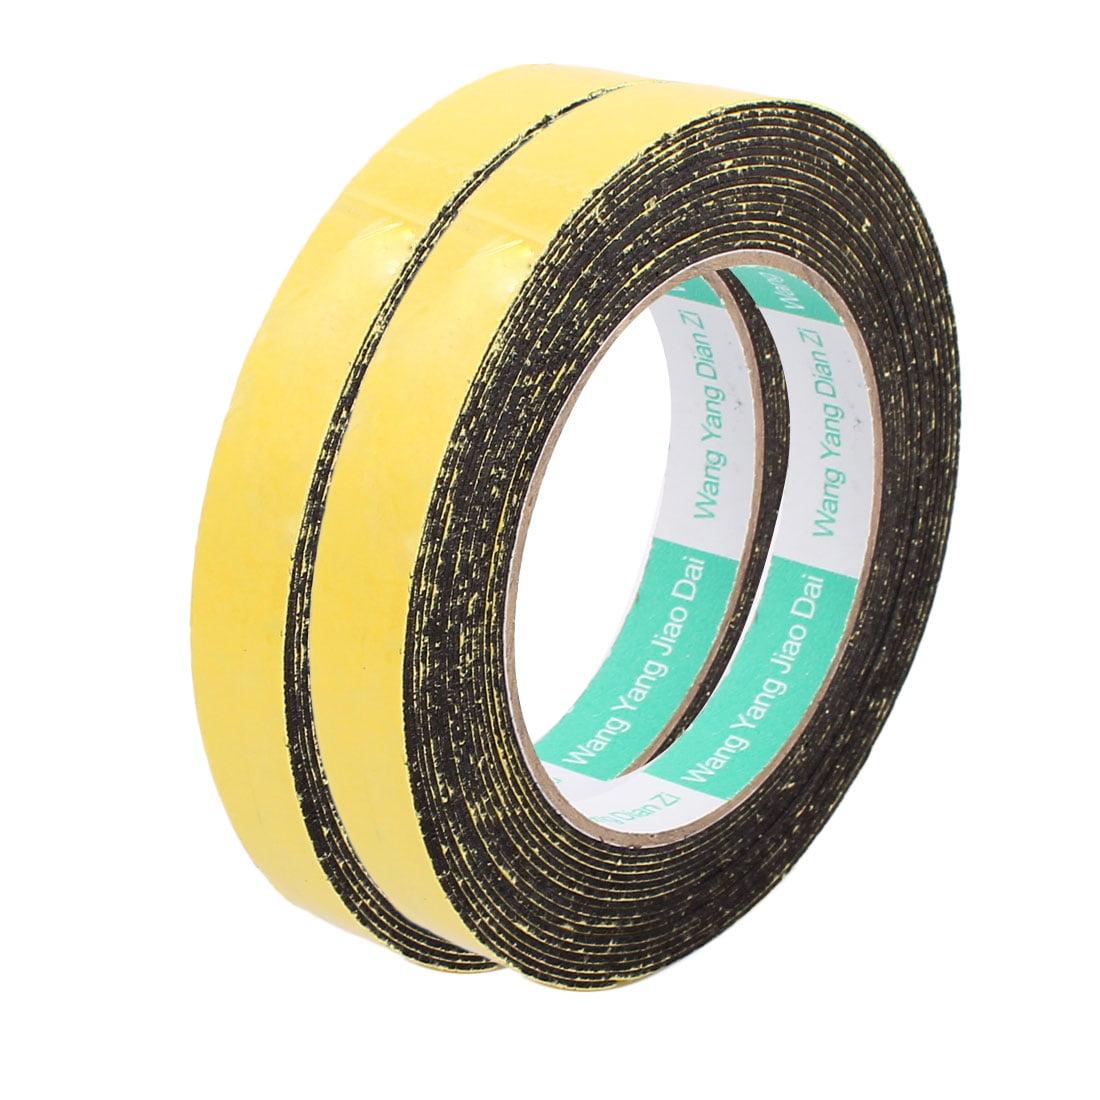 2pcs 15mm x 1mm Single Sided Self Adhesive Shockproof Sponge Foam Tape 5M Length